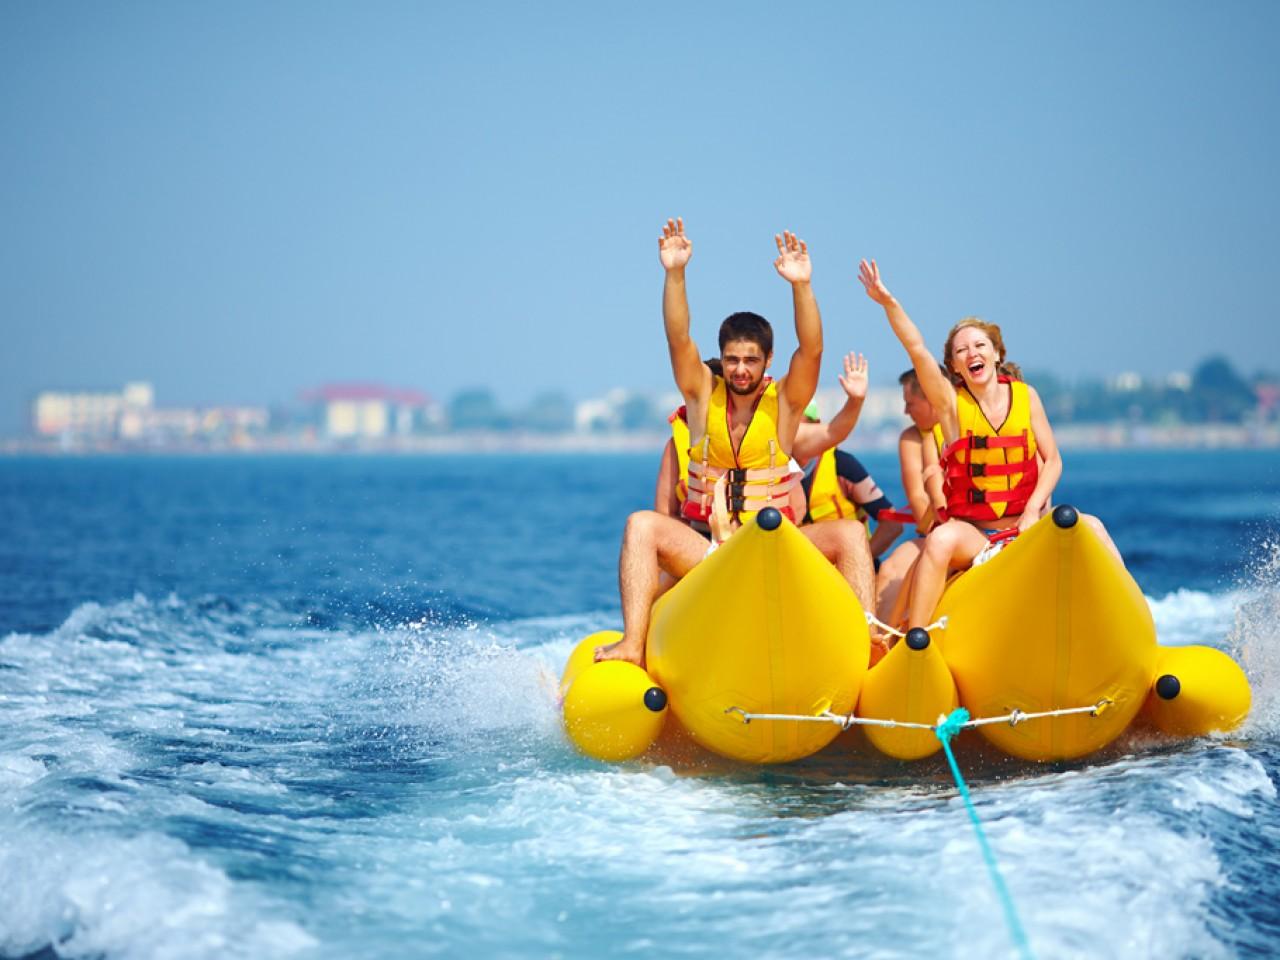 SUMMER STAYCATION: Dana Beach Hotel, Hurghada